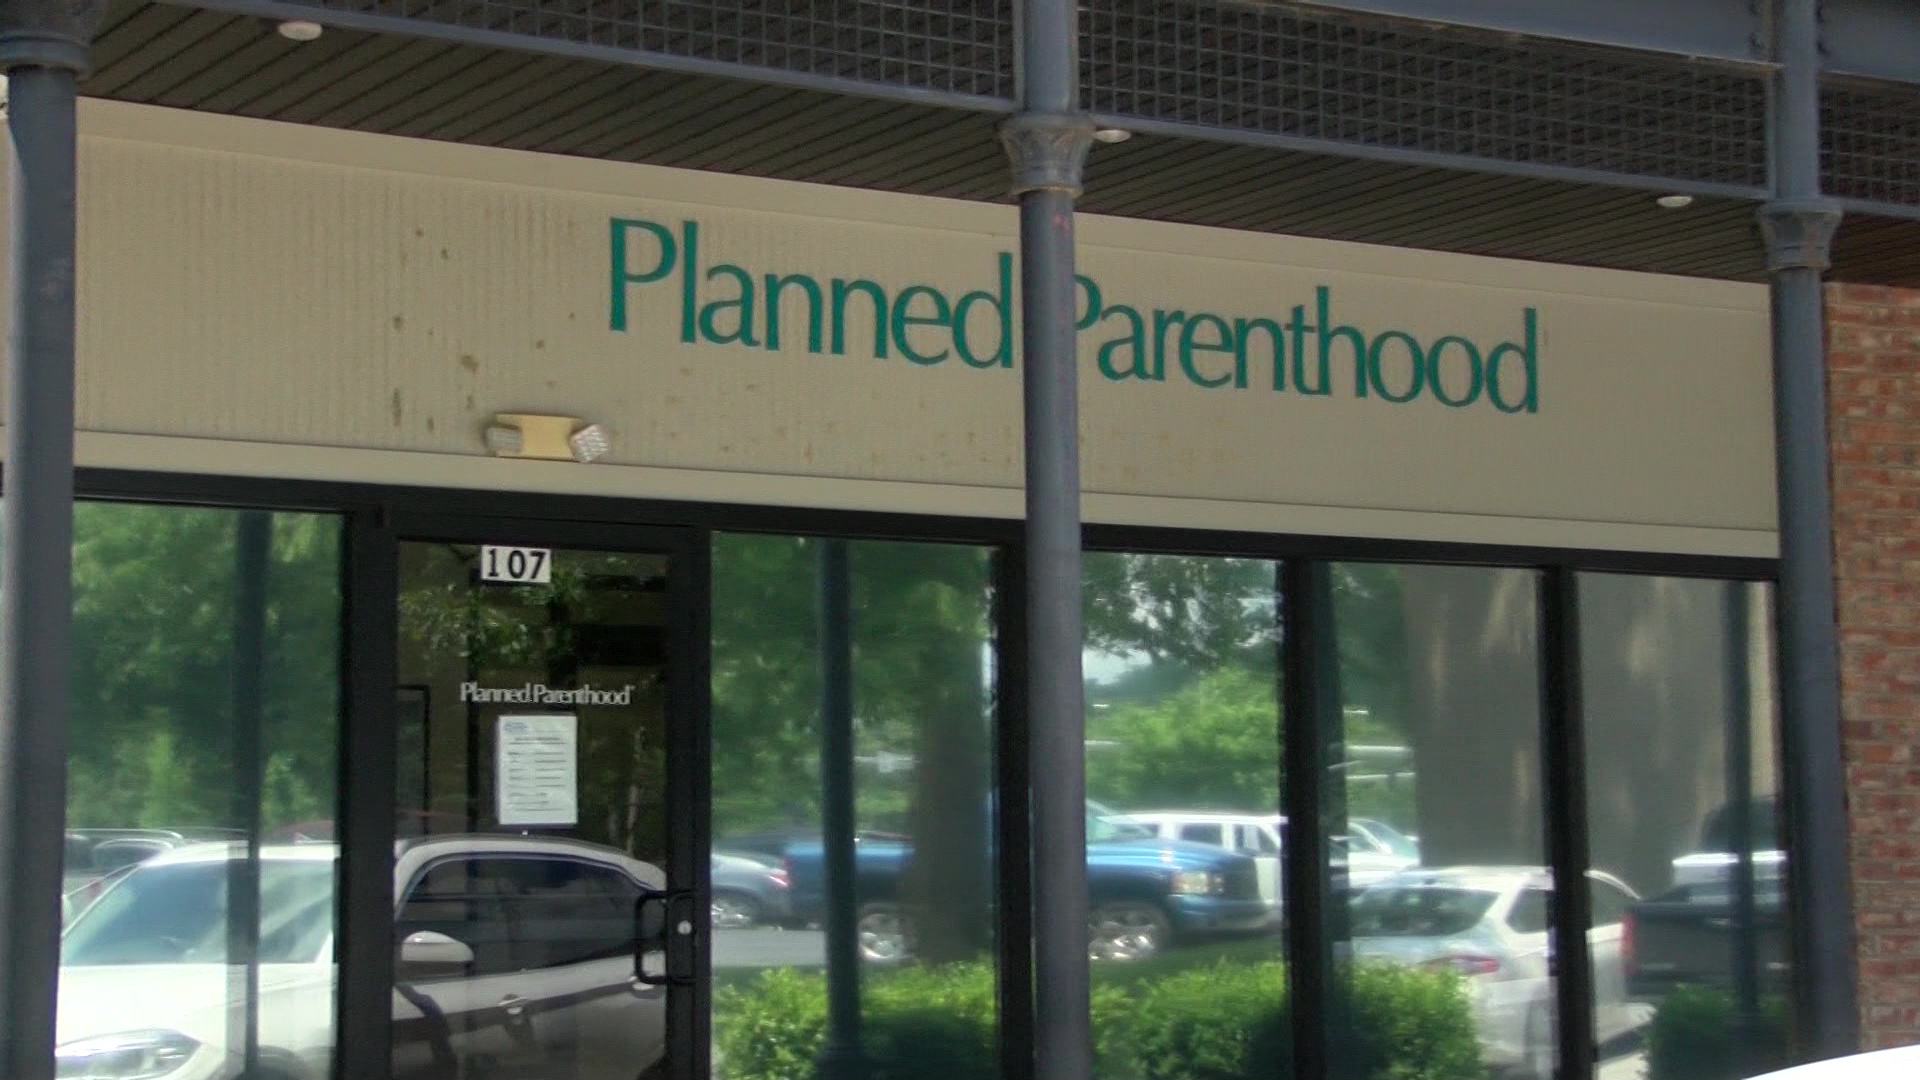 Planned Parenthood Fayetteville_1560547300748.jpg.jpg